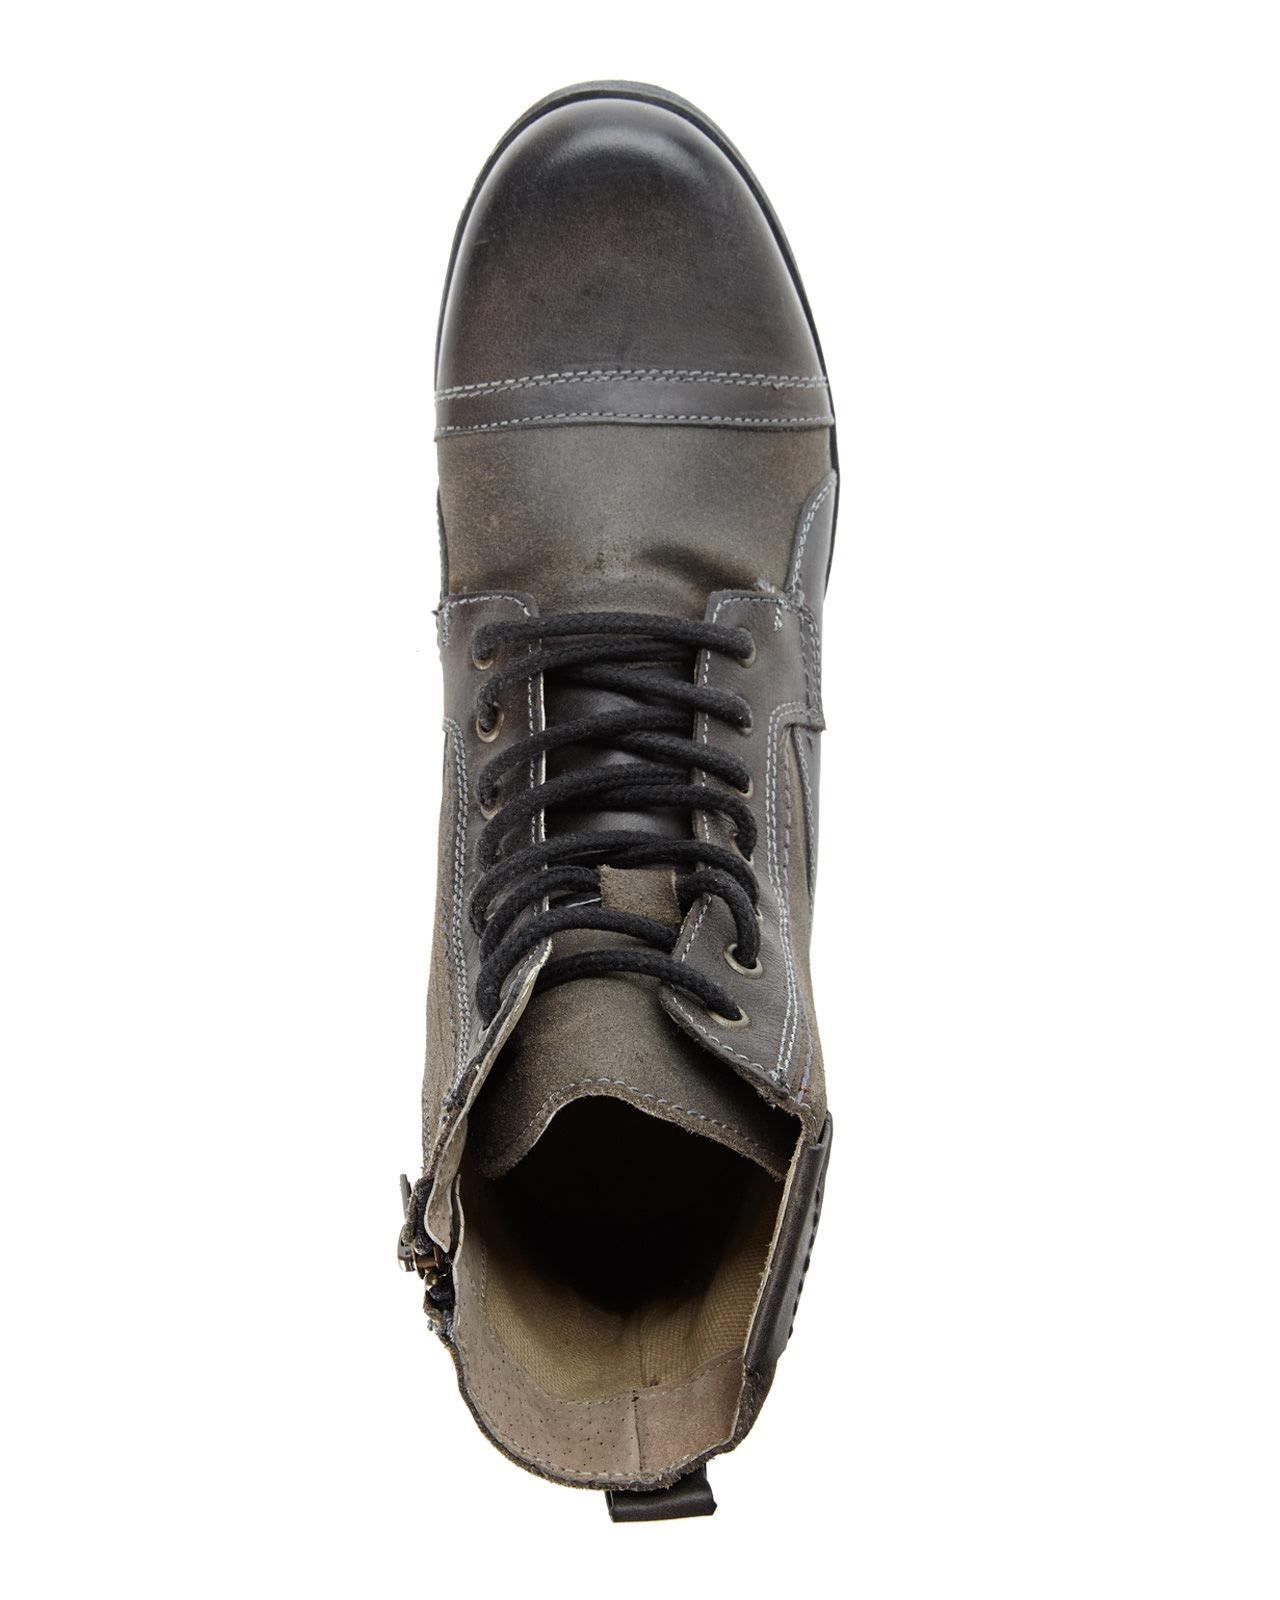 1249b72ff8a Steve Madden Gray Grey Triggah Cap Toe Boots for men